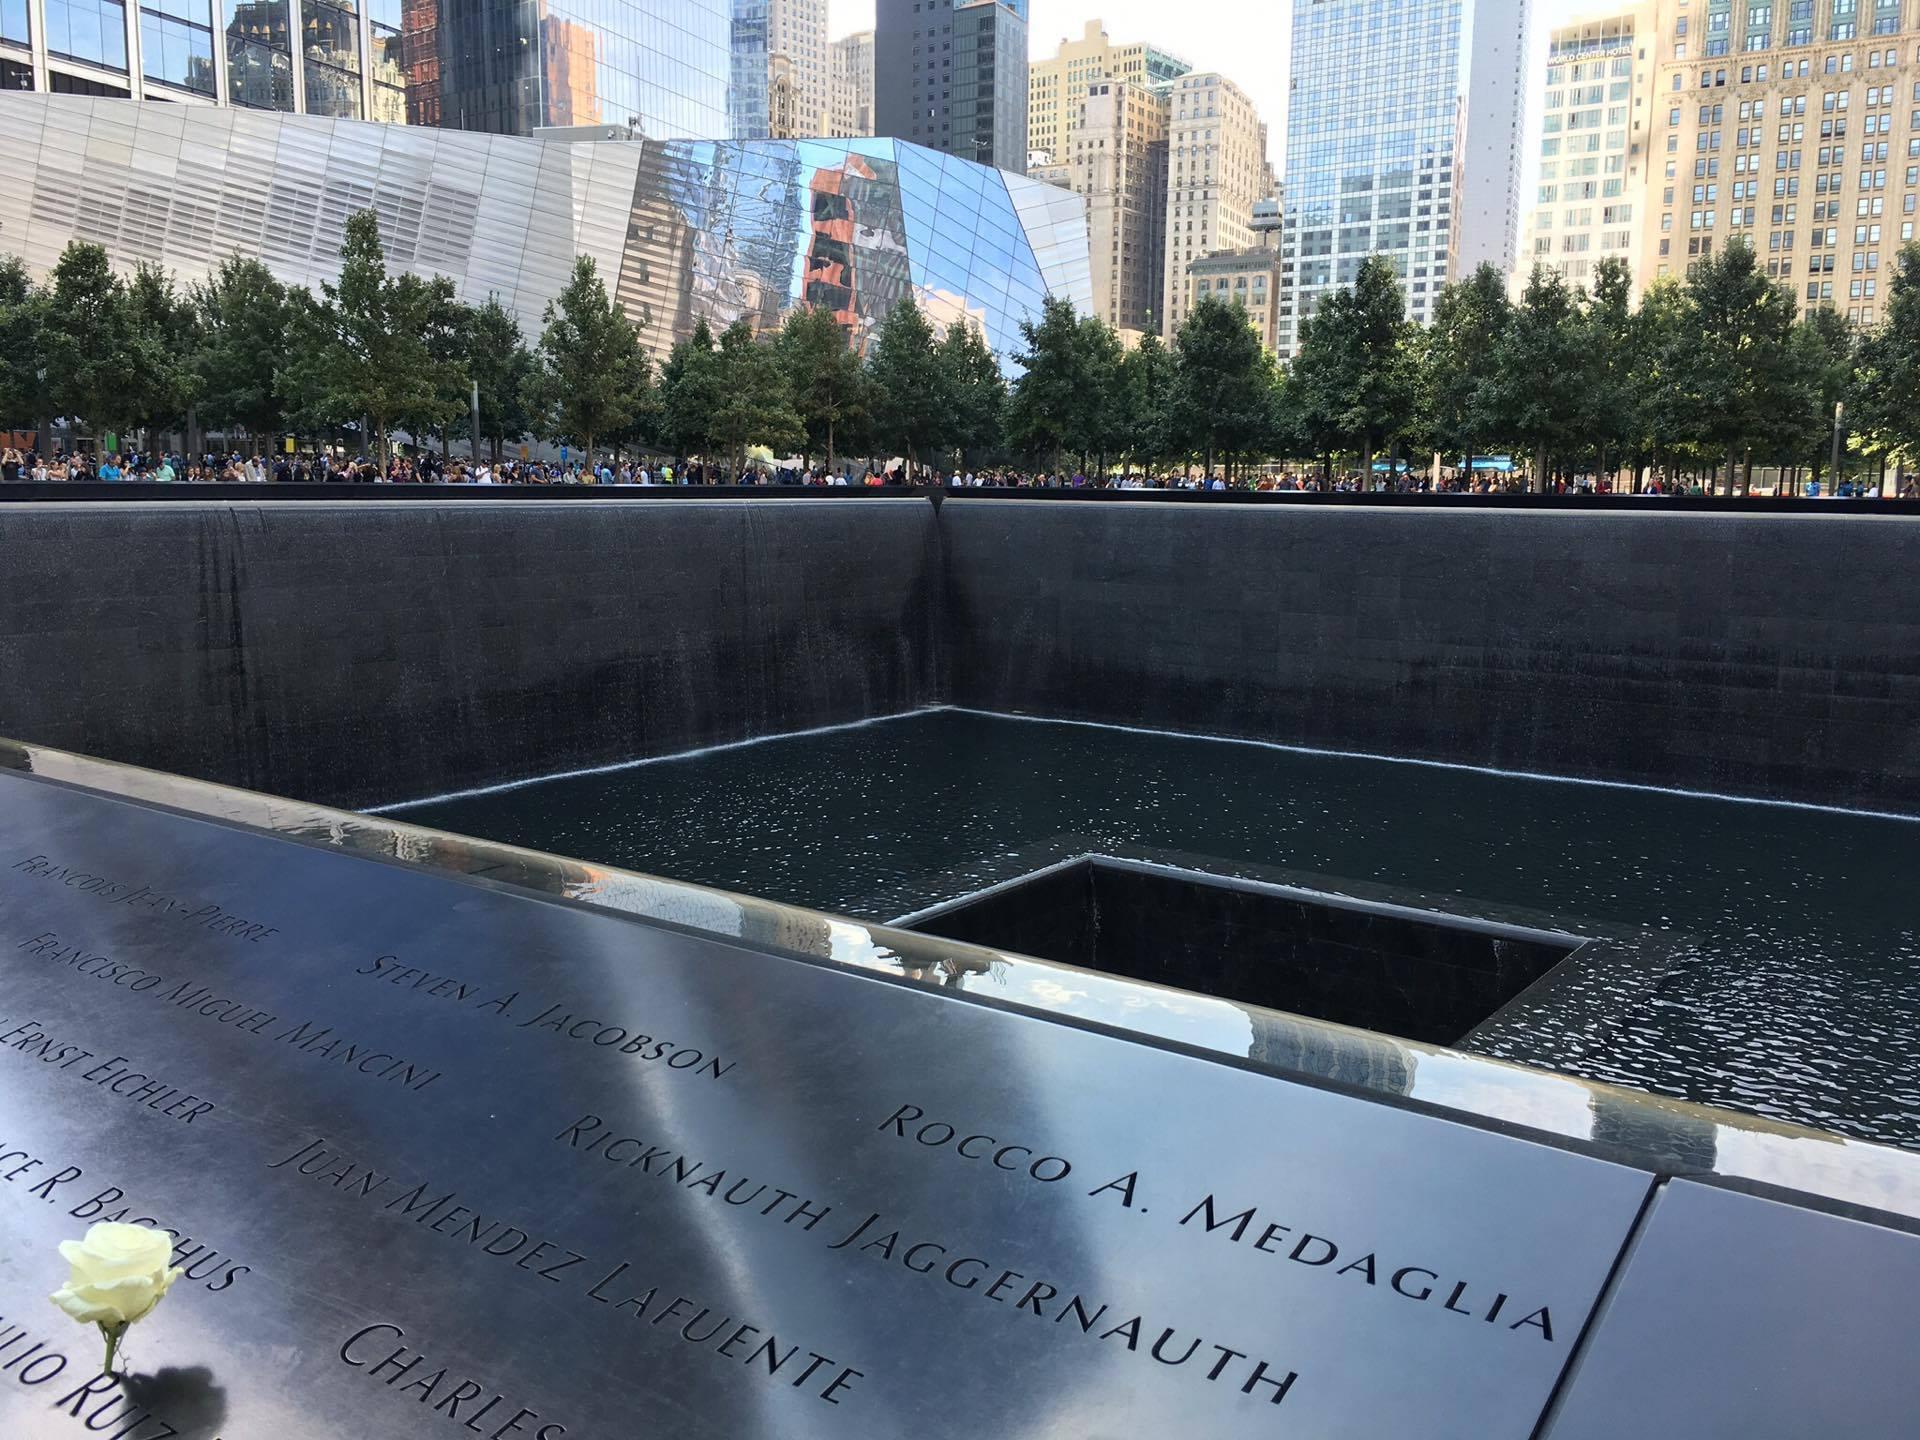 World Trade Center Flugzeug